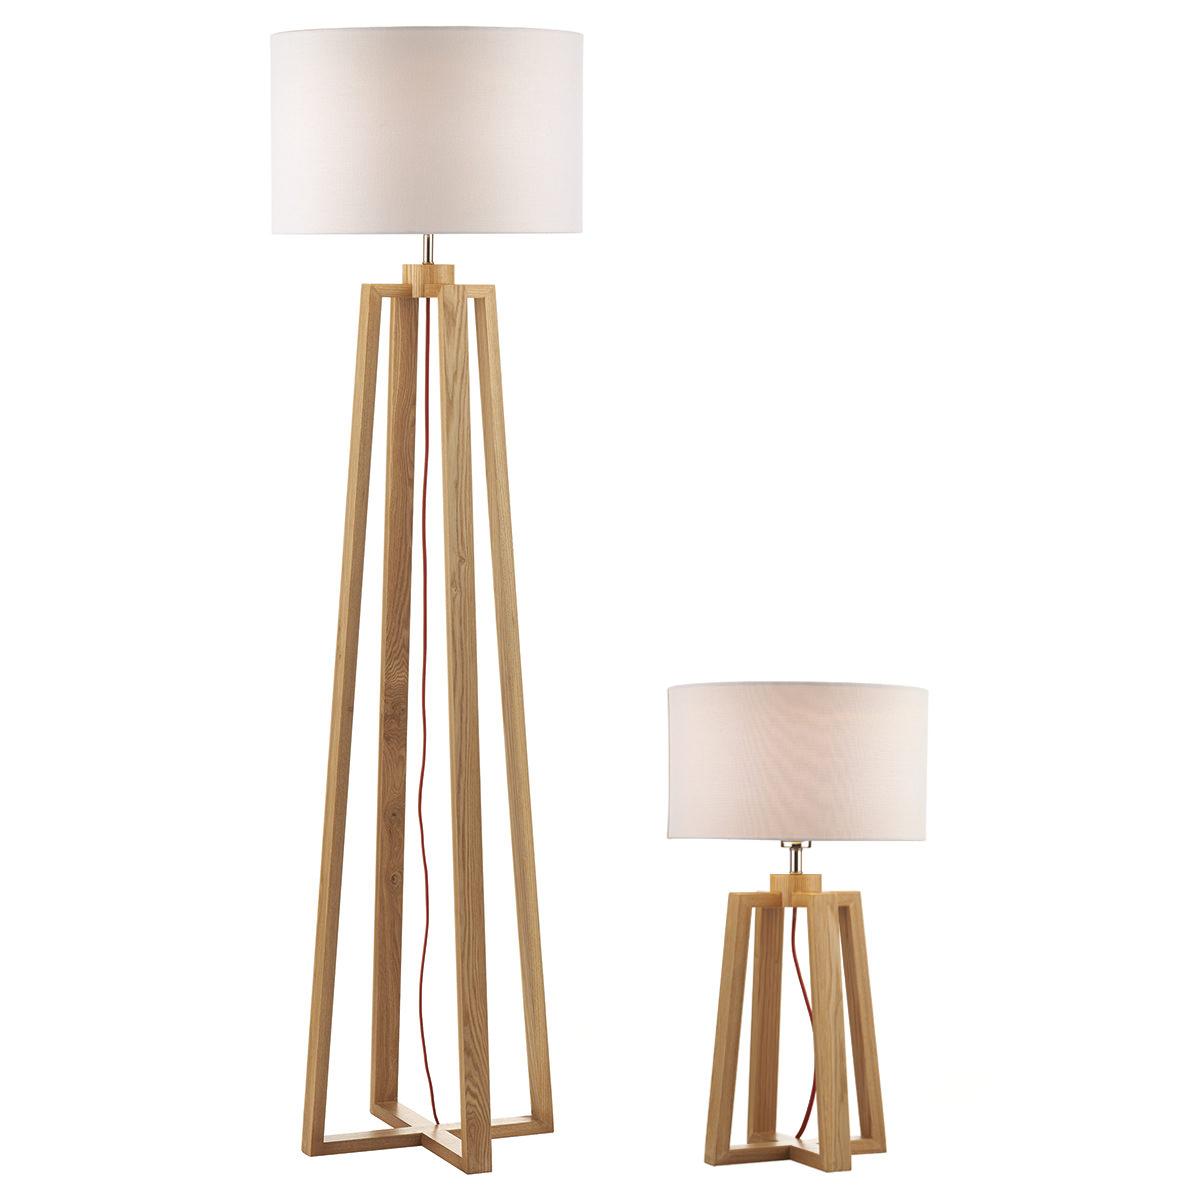 Pyramid Table Lamp And Floor Lamp Twincw Shade